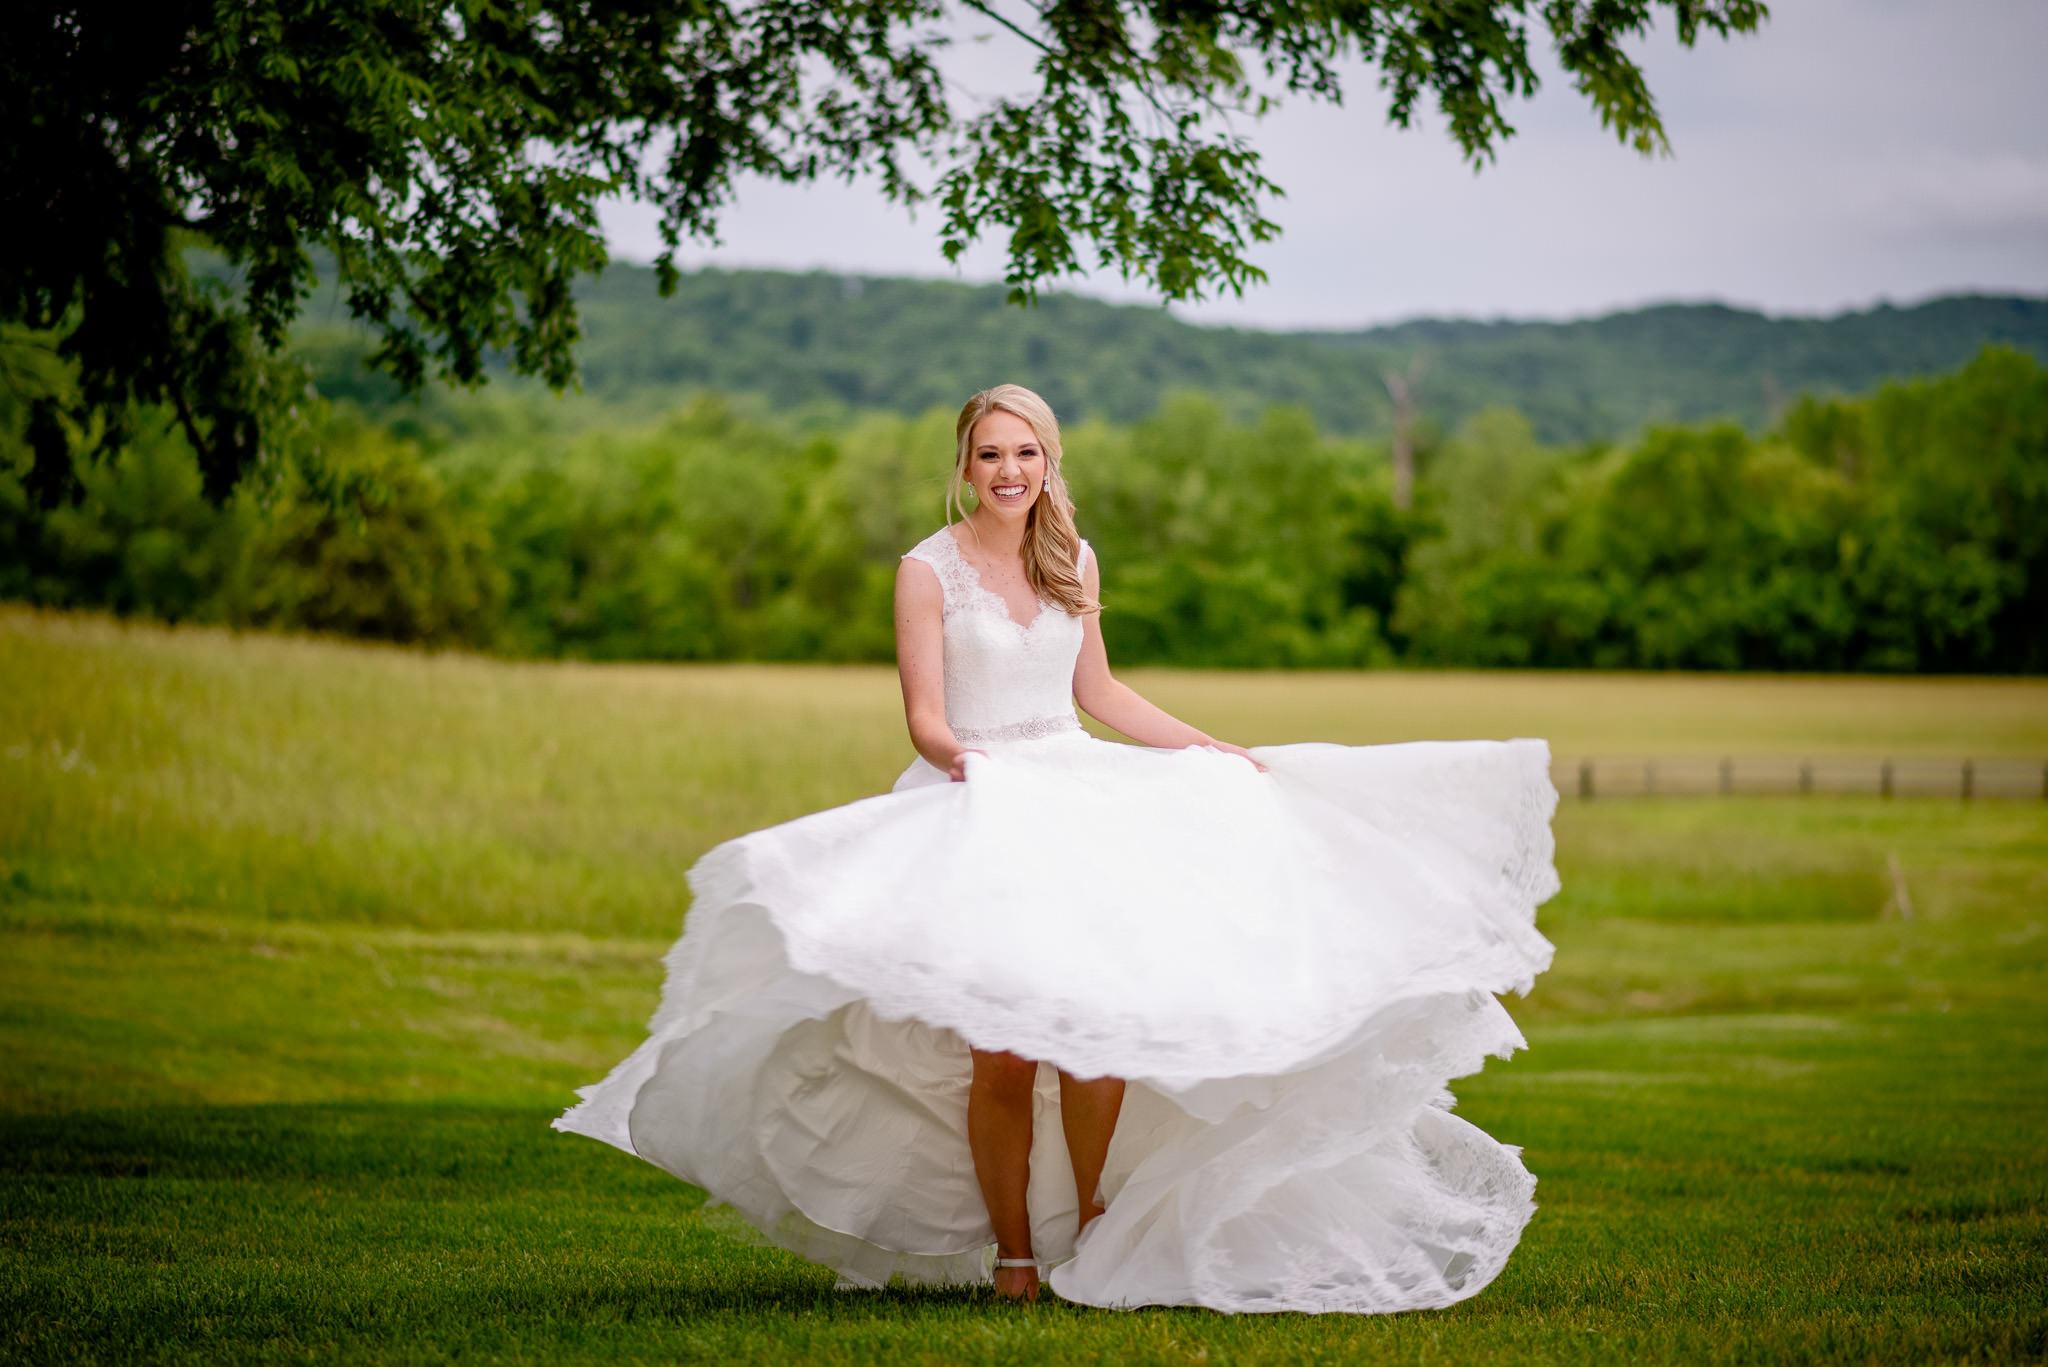 Greg and Jess Photography Nashville Portrait and Wedding Photographer 28.jpg